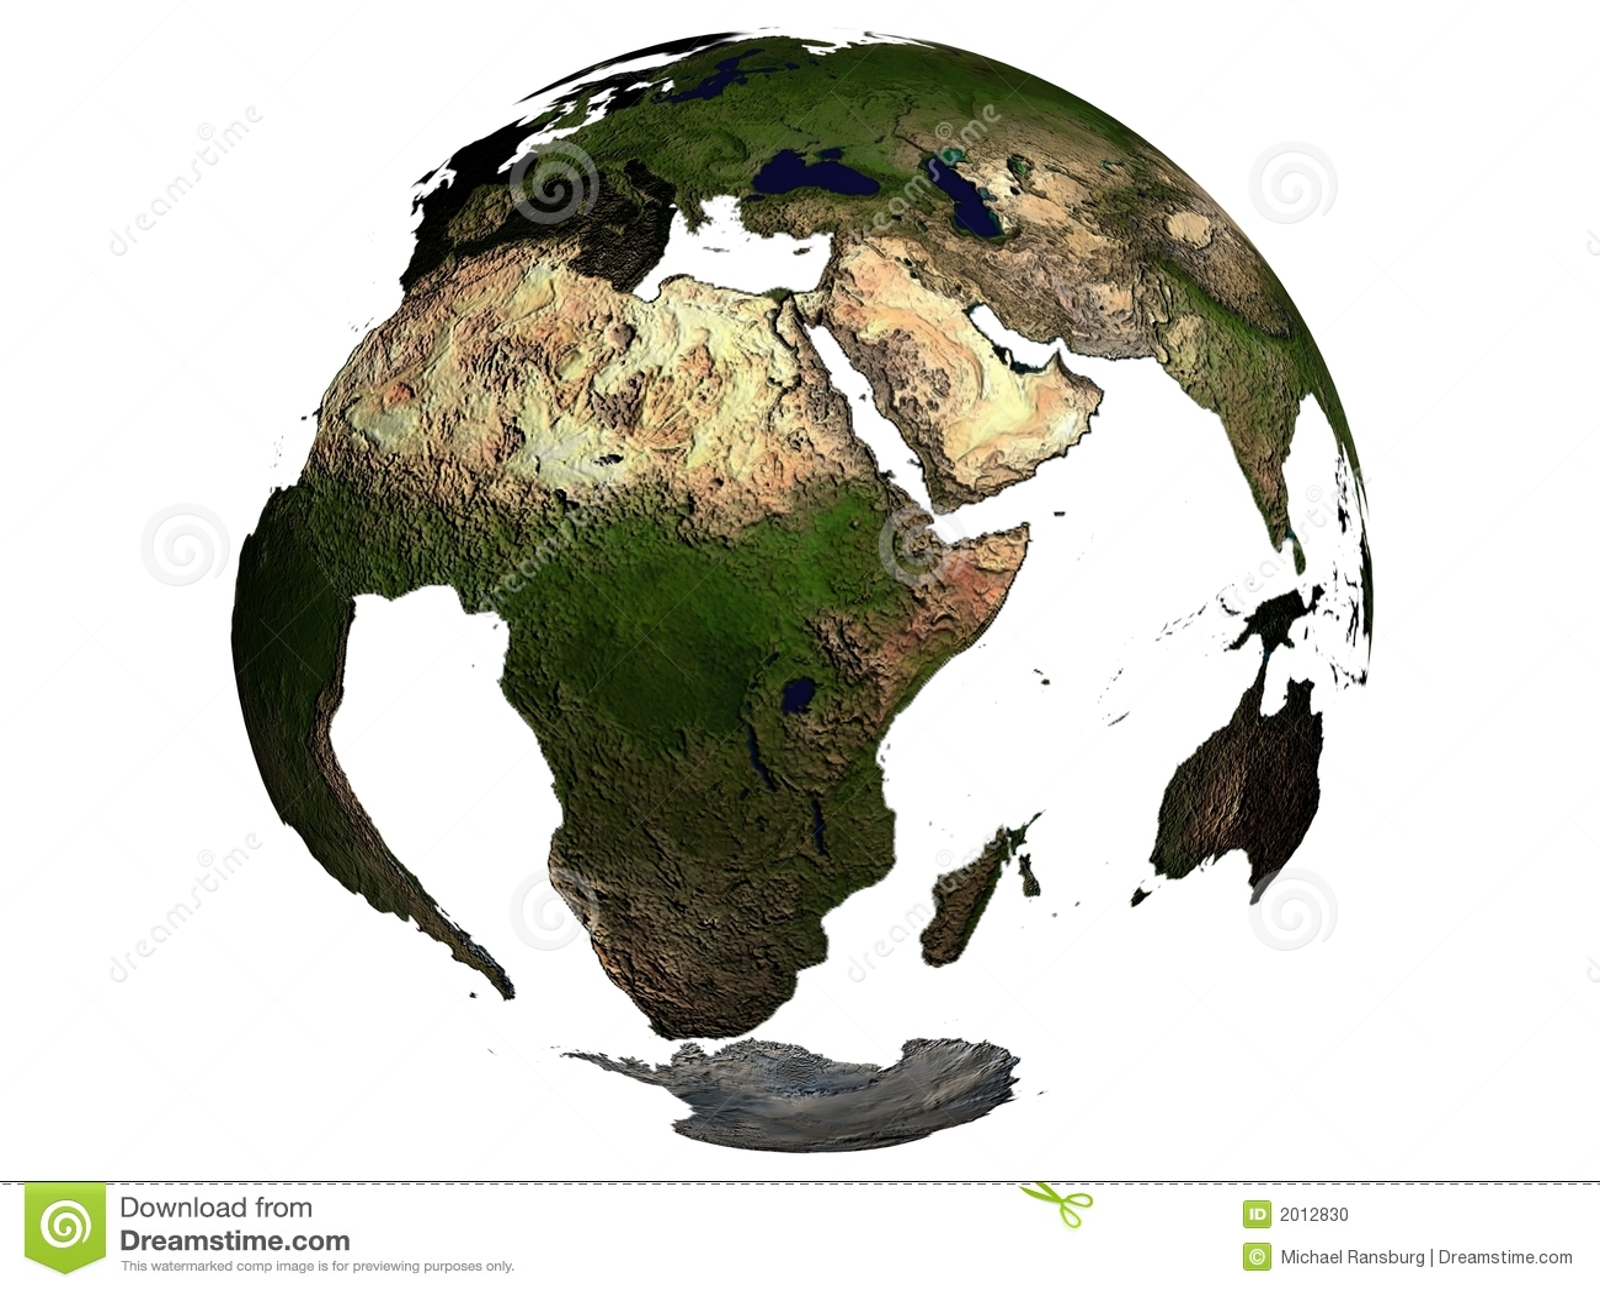 africa on an earth globe stock illustration illustration of